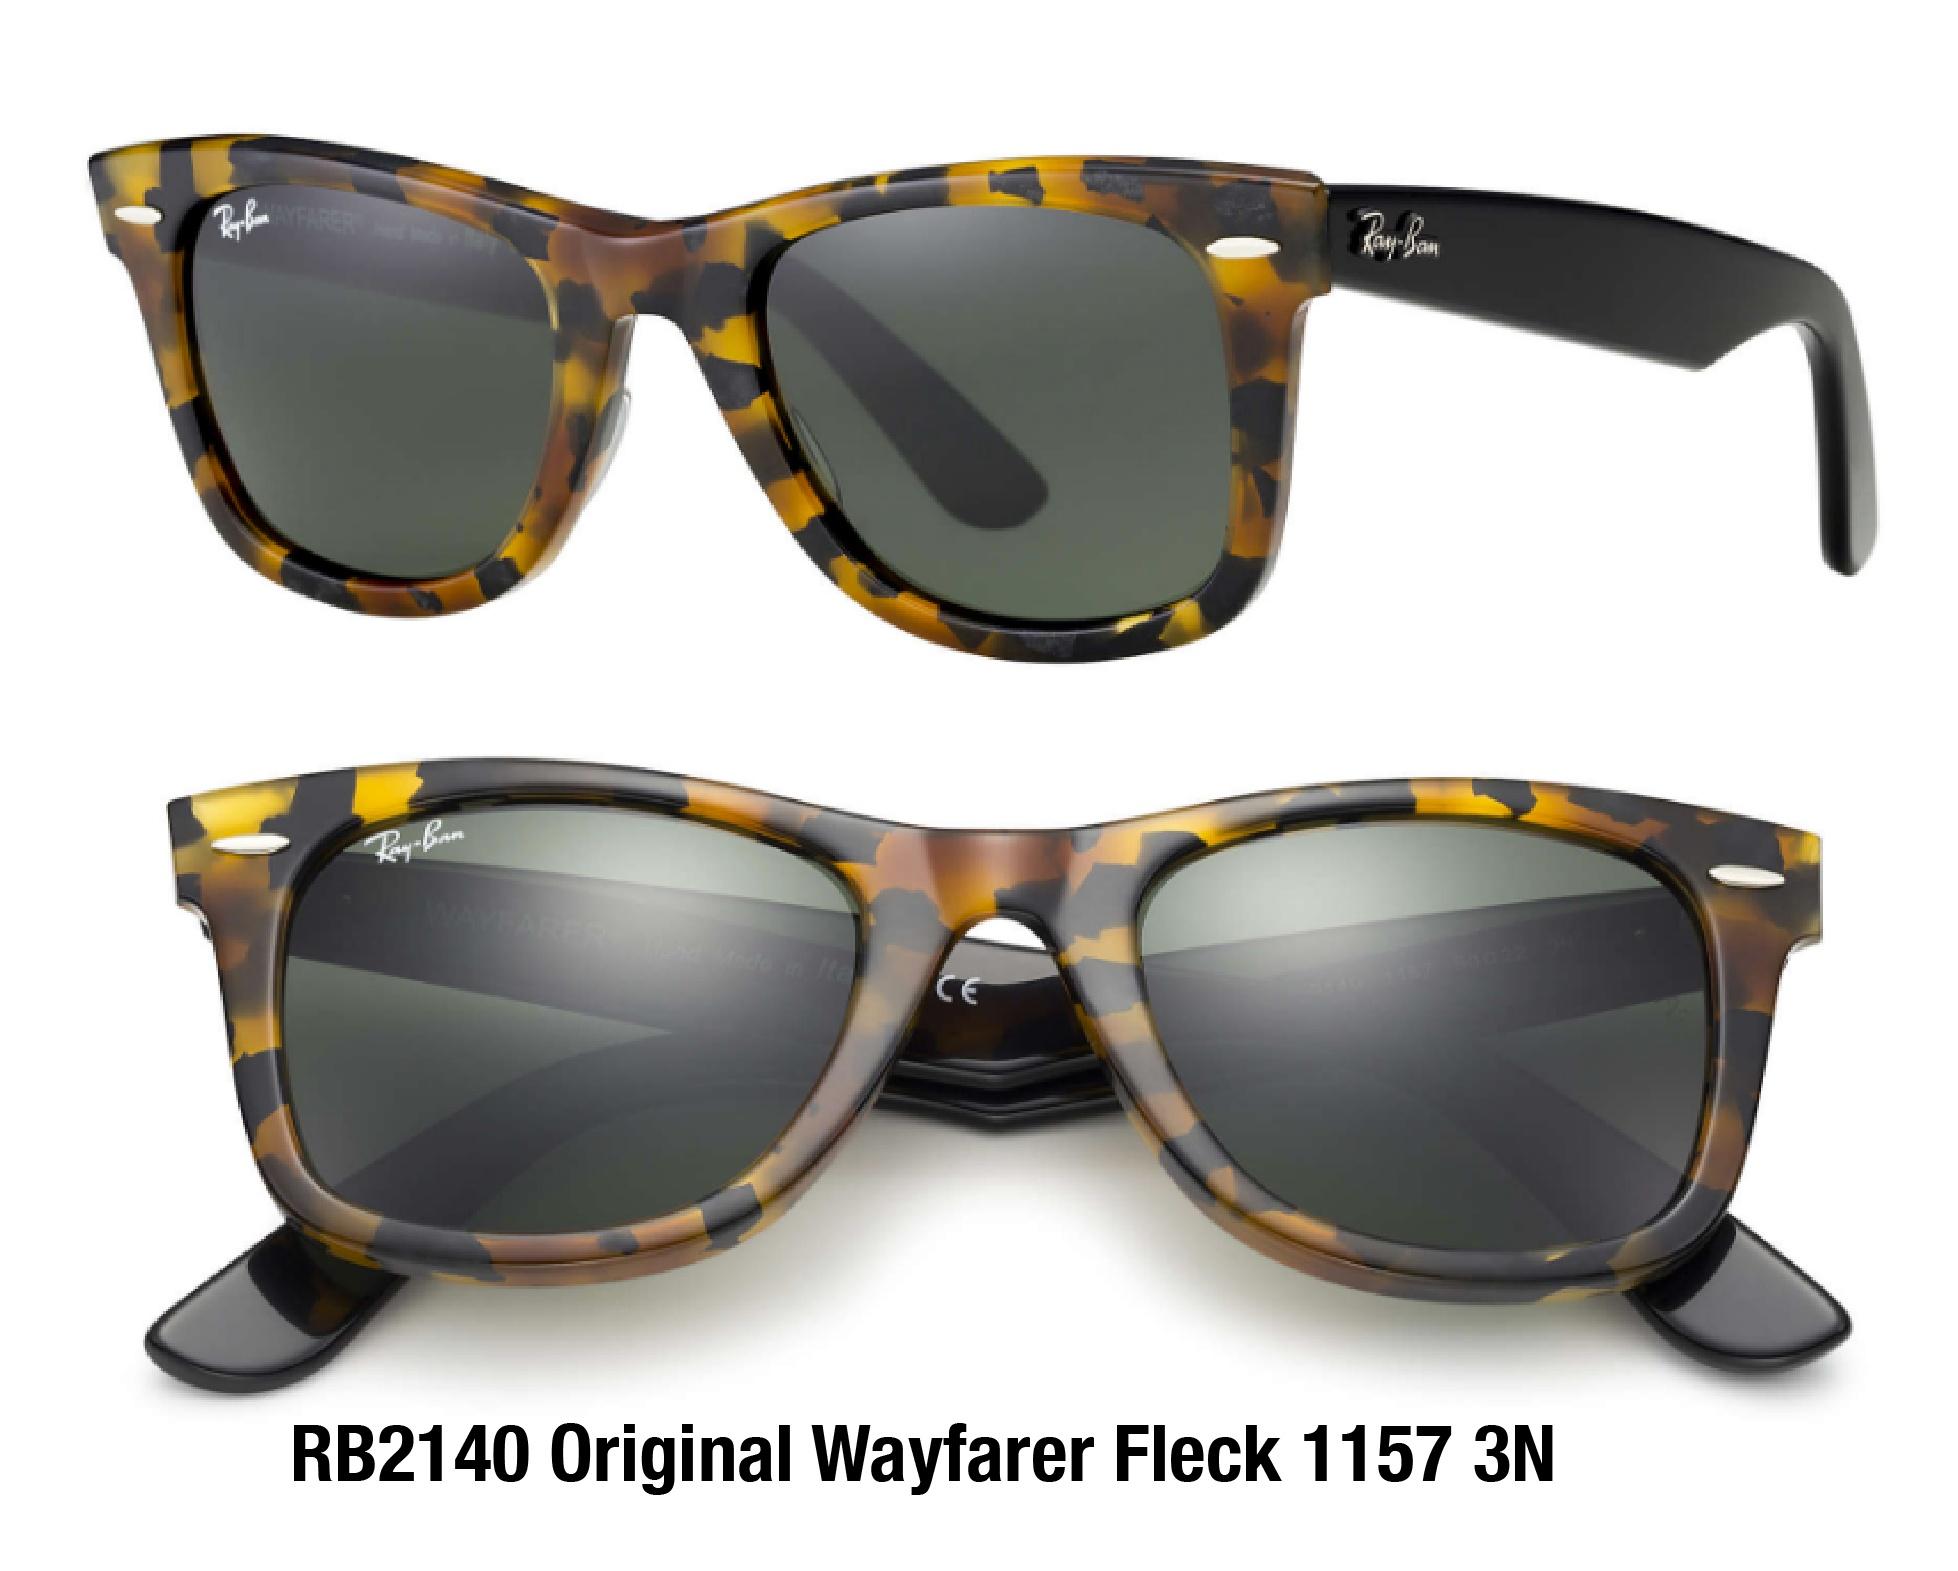 104716578e7 Where To Buy Ray Ban Sunglasses In Toronto « Heritage Malta